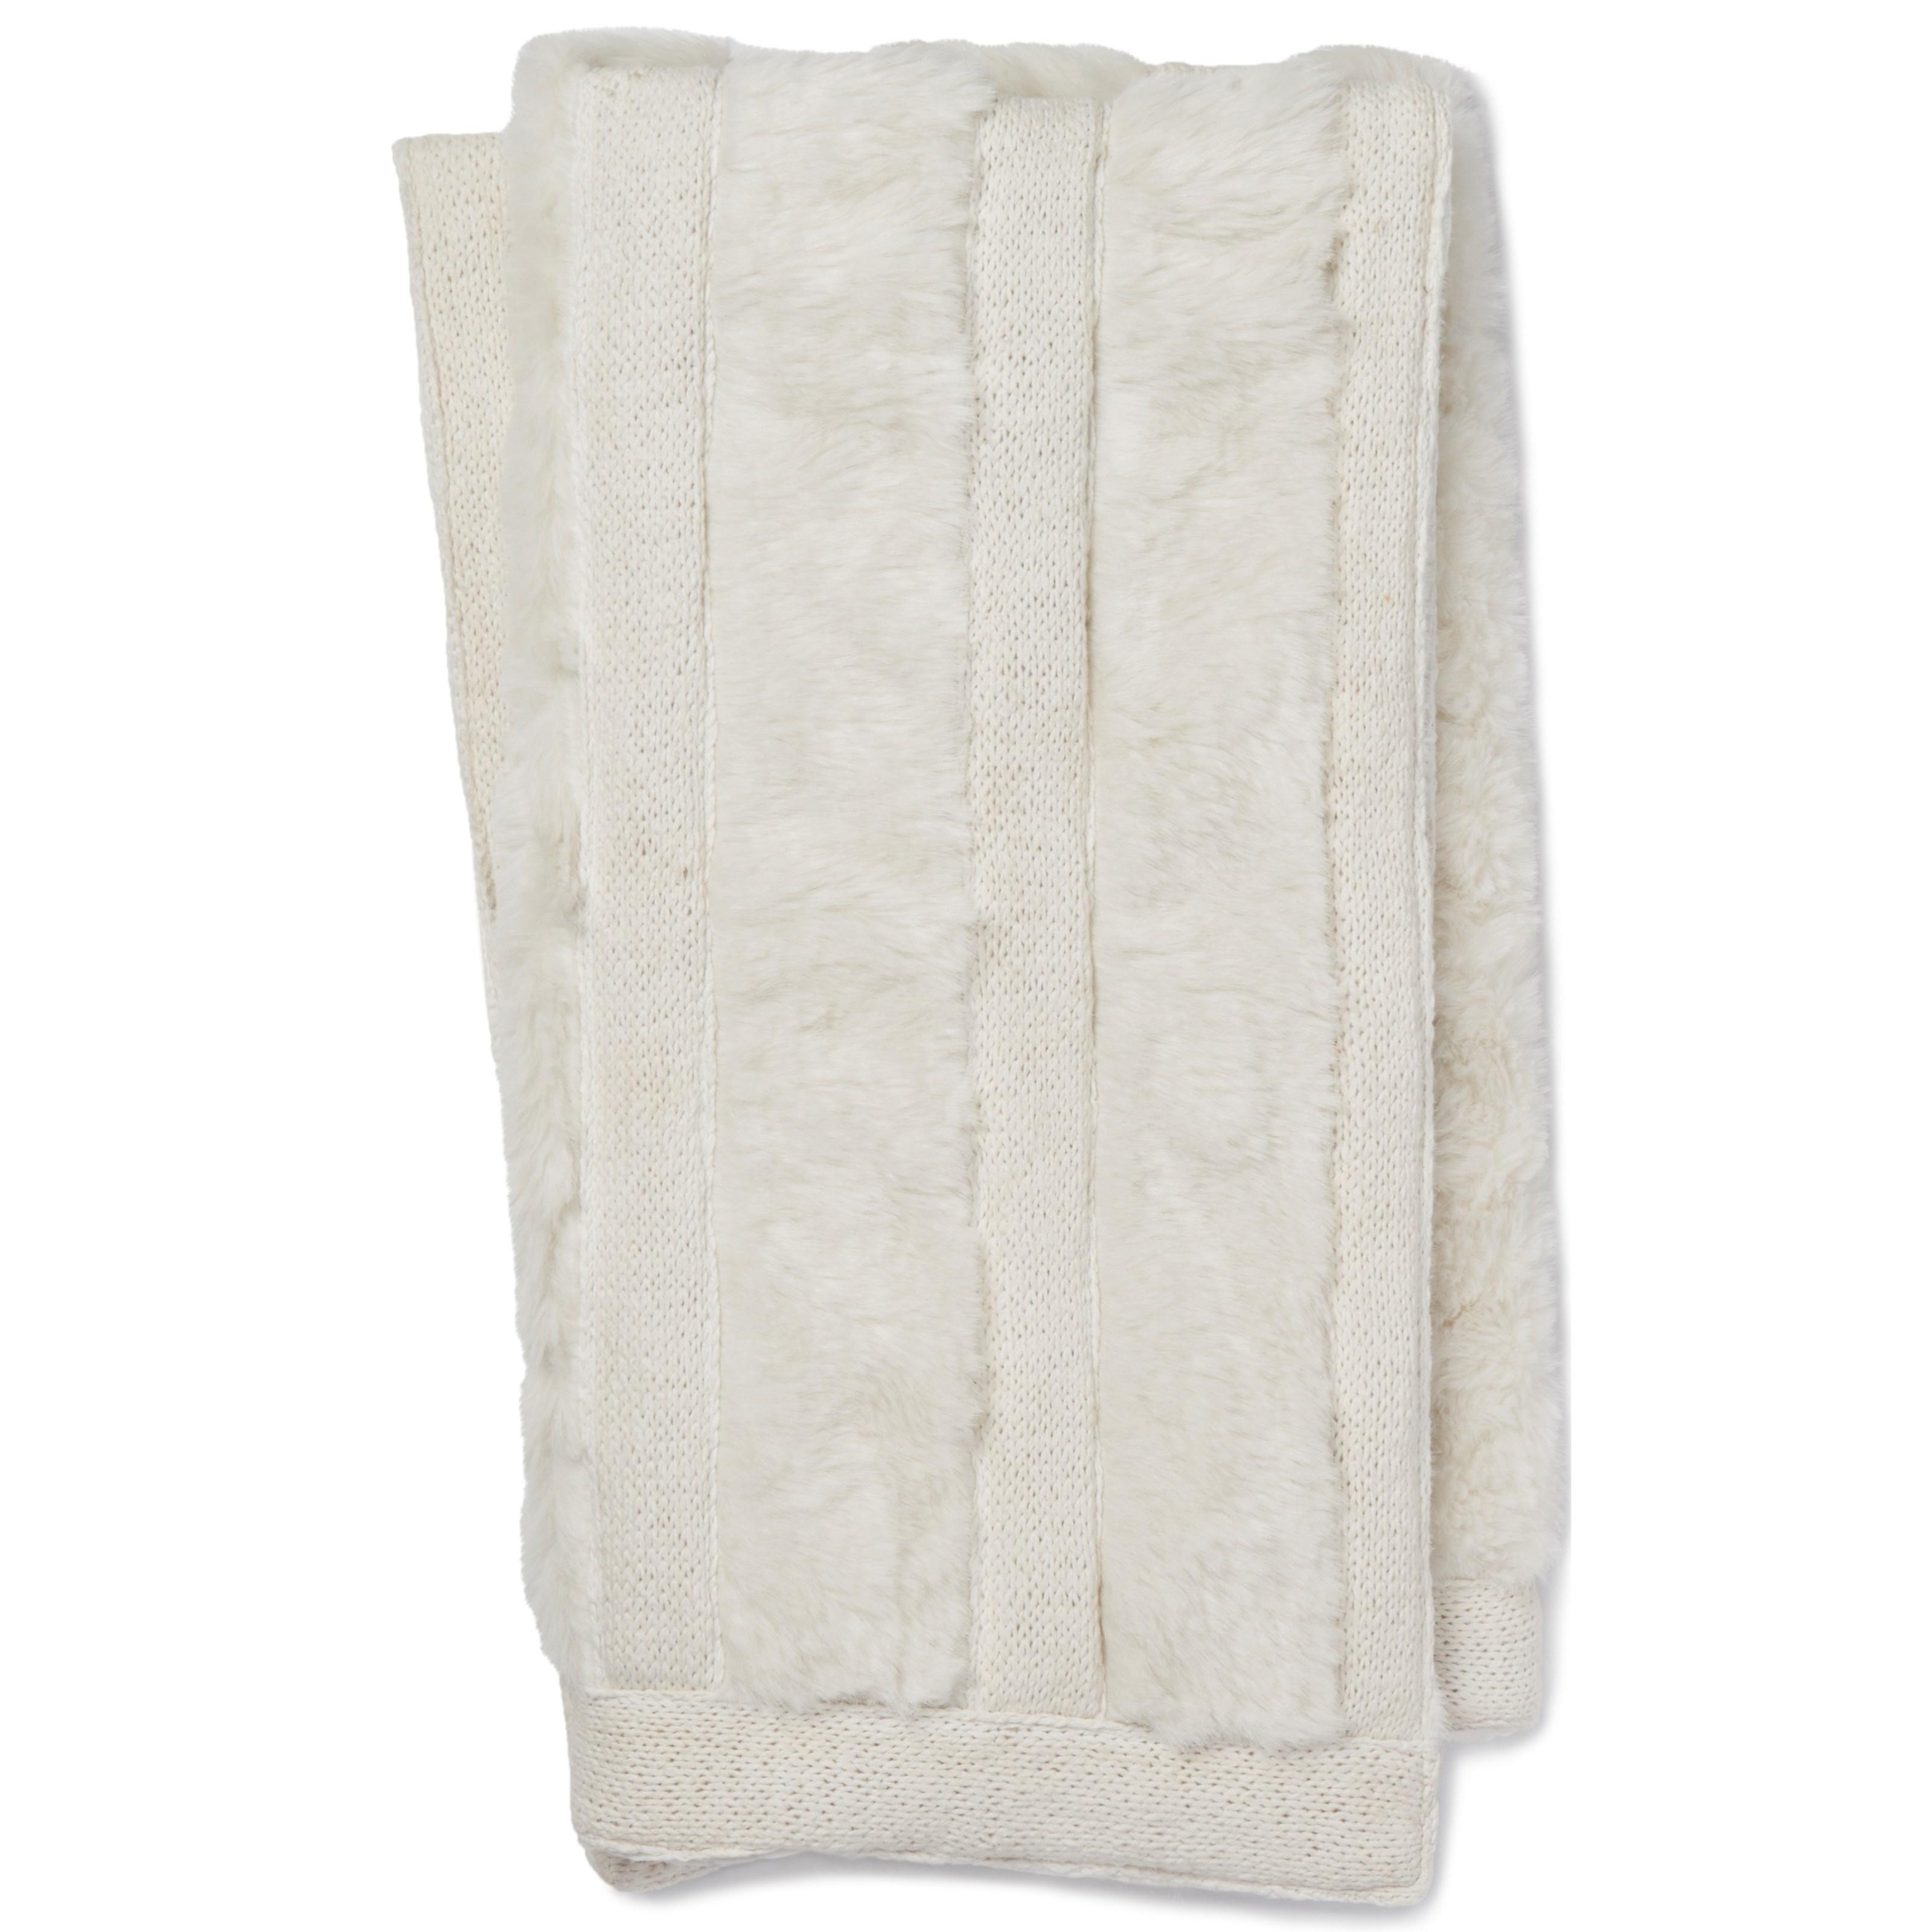 "Neva 4'2"" x 5' White Throw by Loloi Rugs at Virginia Furniture Market"